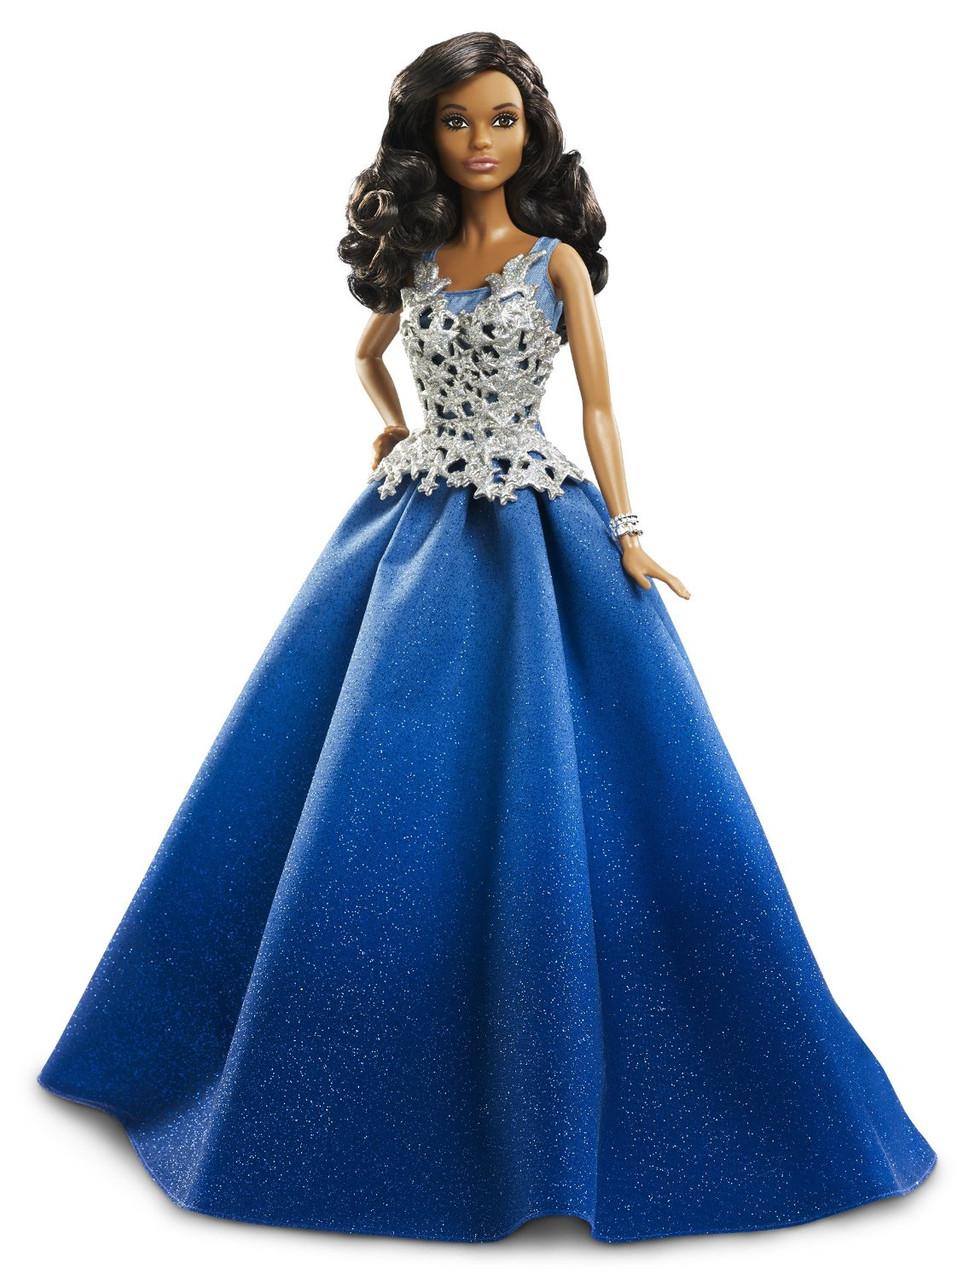 "Лялька Барбі Новорічна 2016 ""Афроамериканка"" / Barbie Holiday African American Doll"